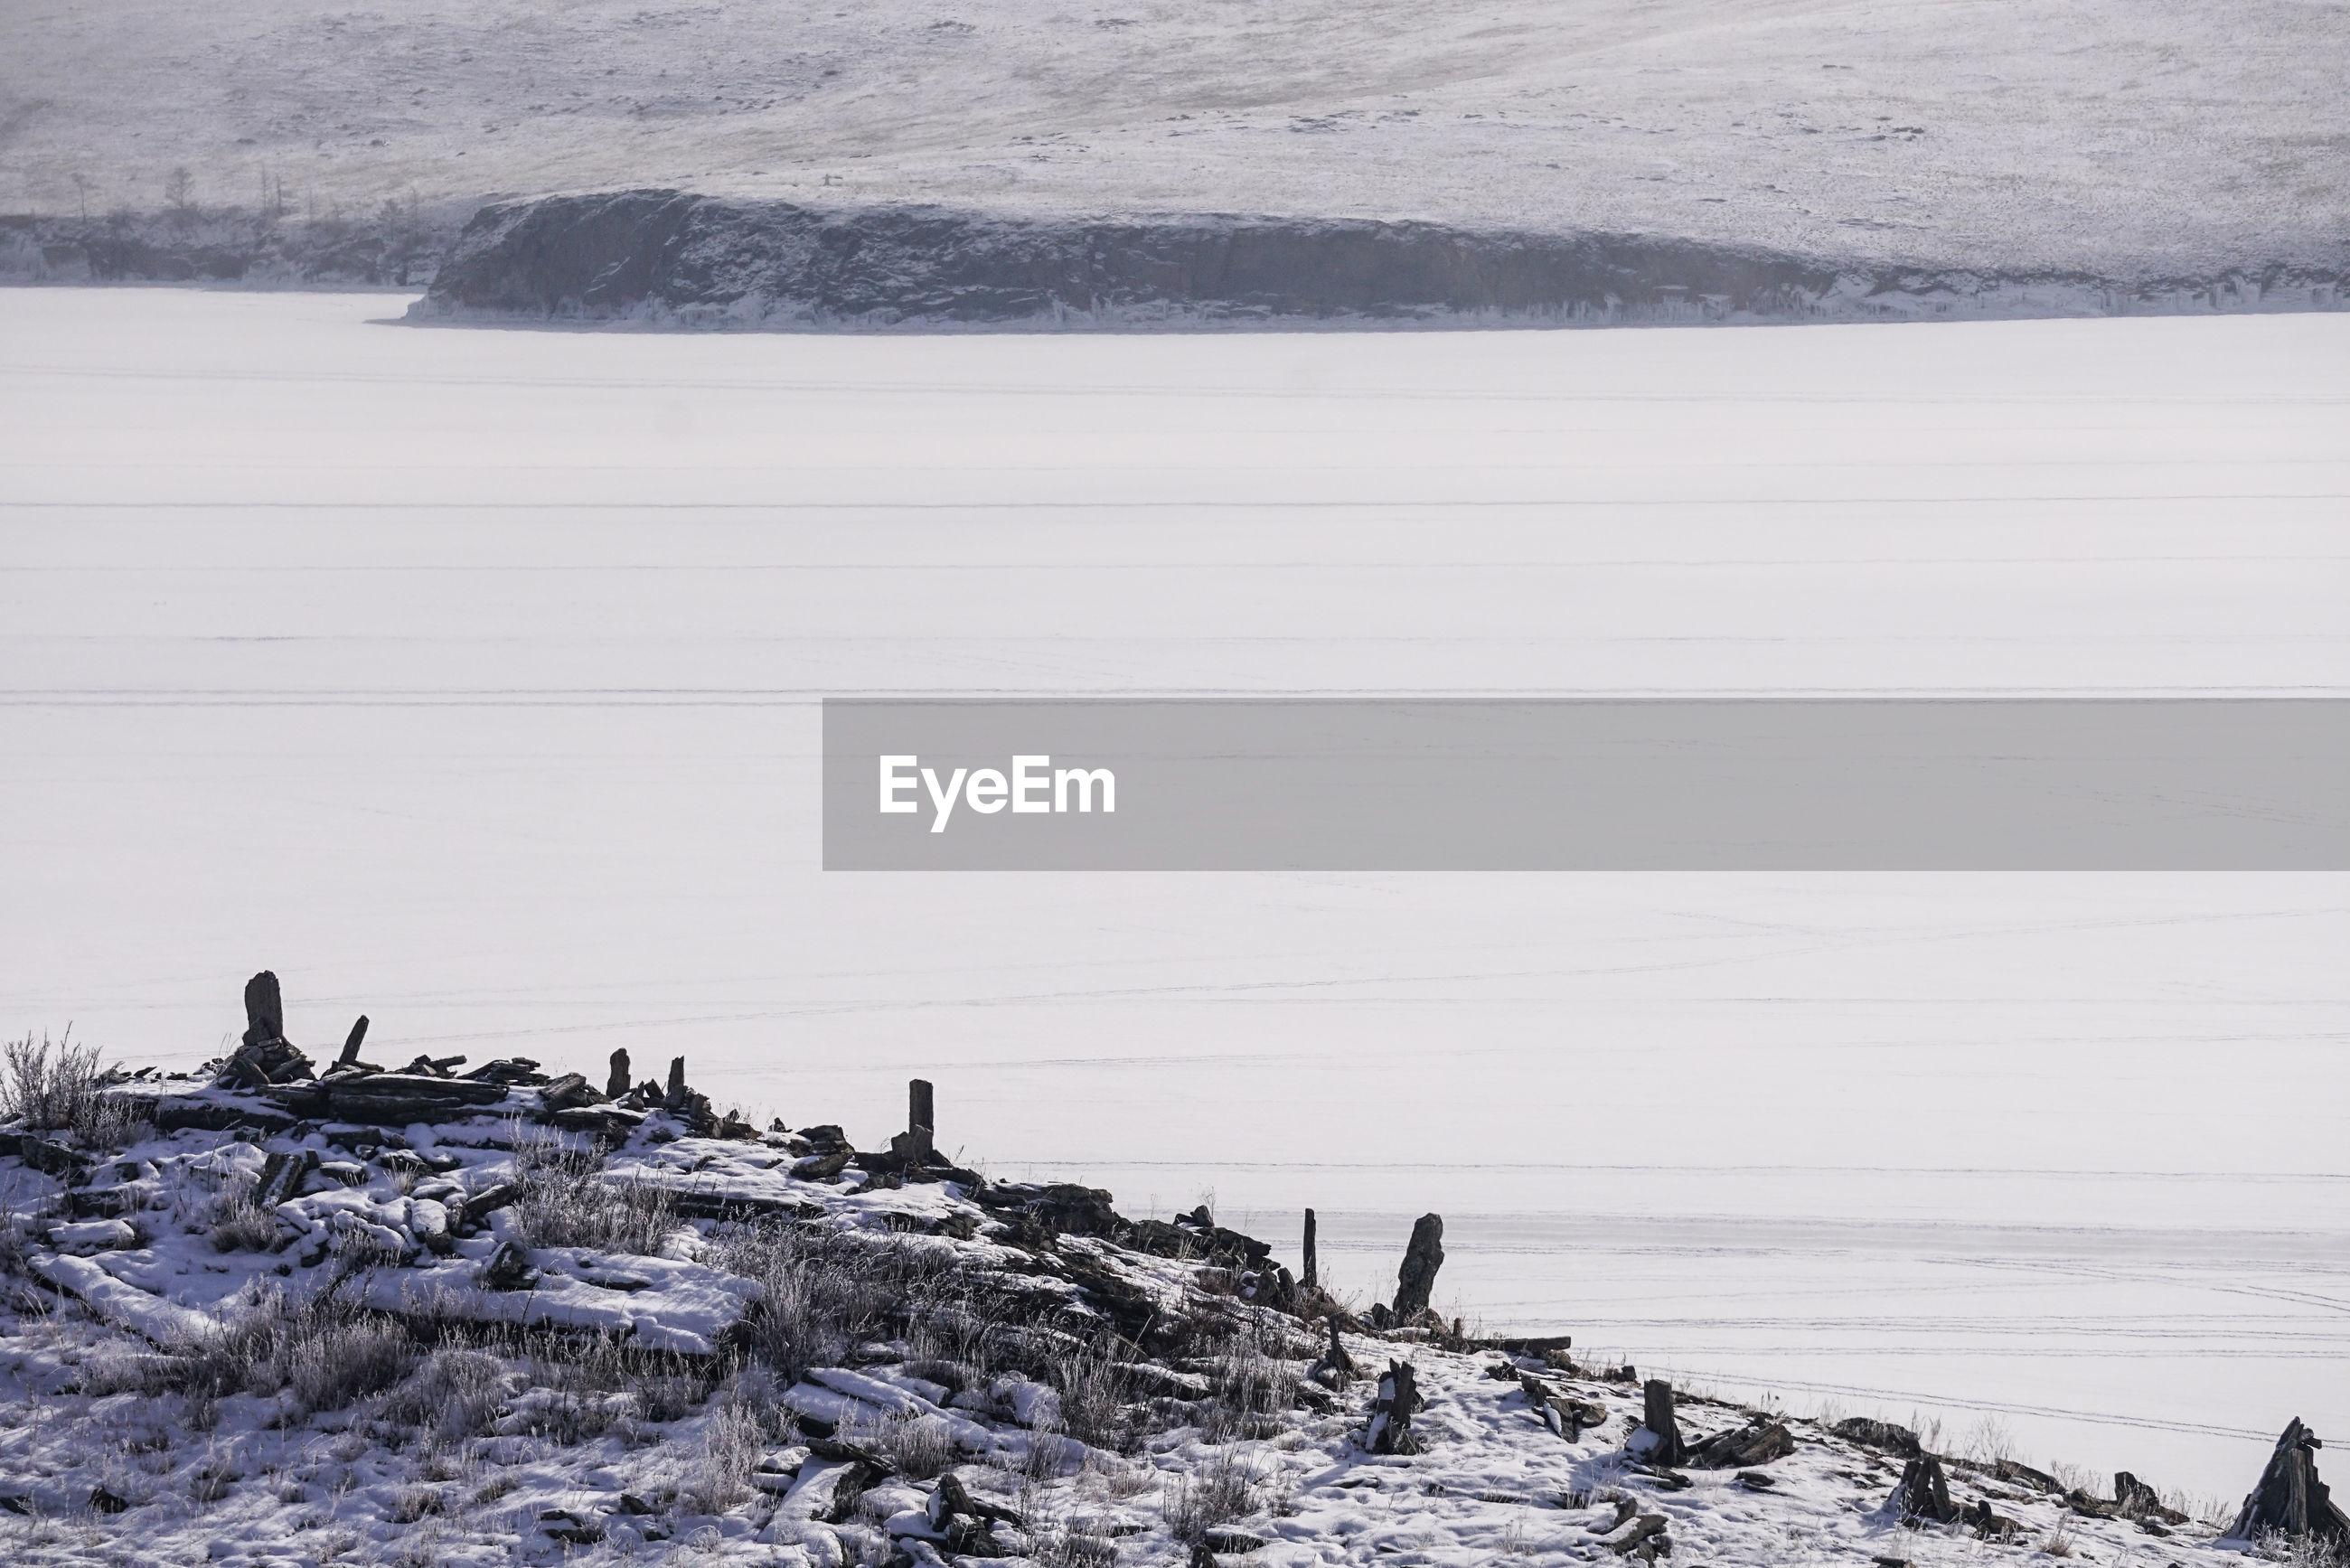 Landscape by frozen lake